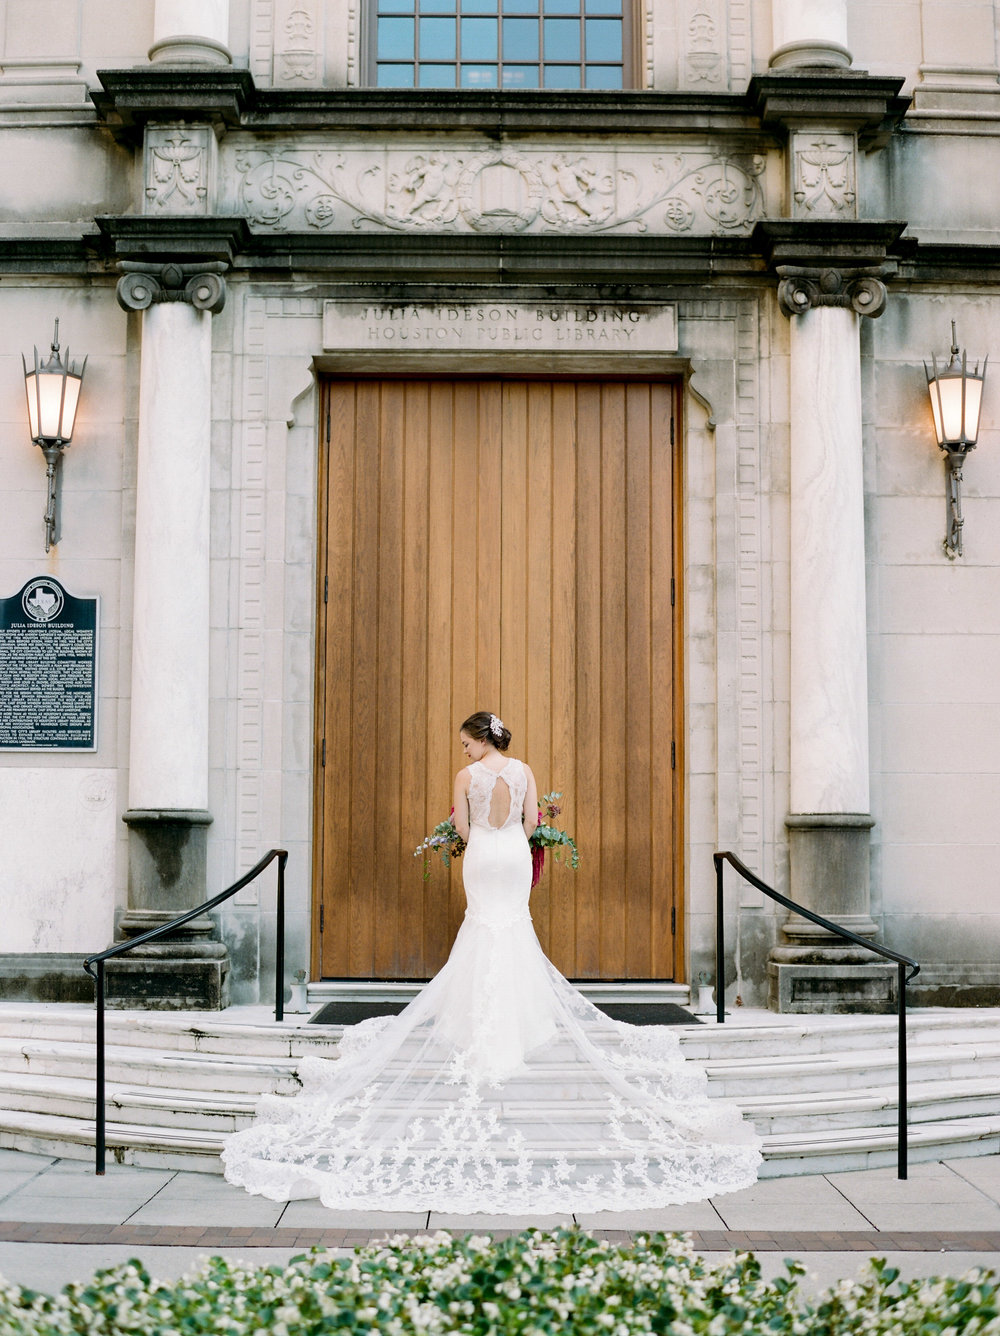 The-Knot-Texas-Fine-Art-Wedding-Film-Destination-Photographer-Houston-Austin-Dallas-New-Orleans-Julia-Ideson-Library-Event-Dana-Josh-Fernandez-Photograph-Top-Best-26.jpg